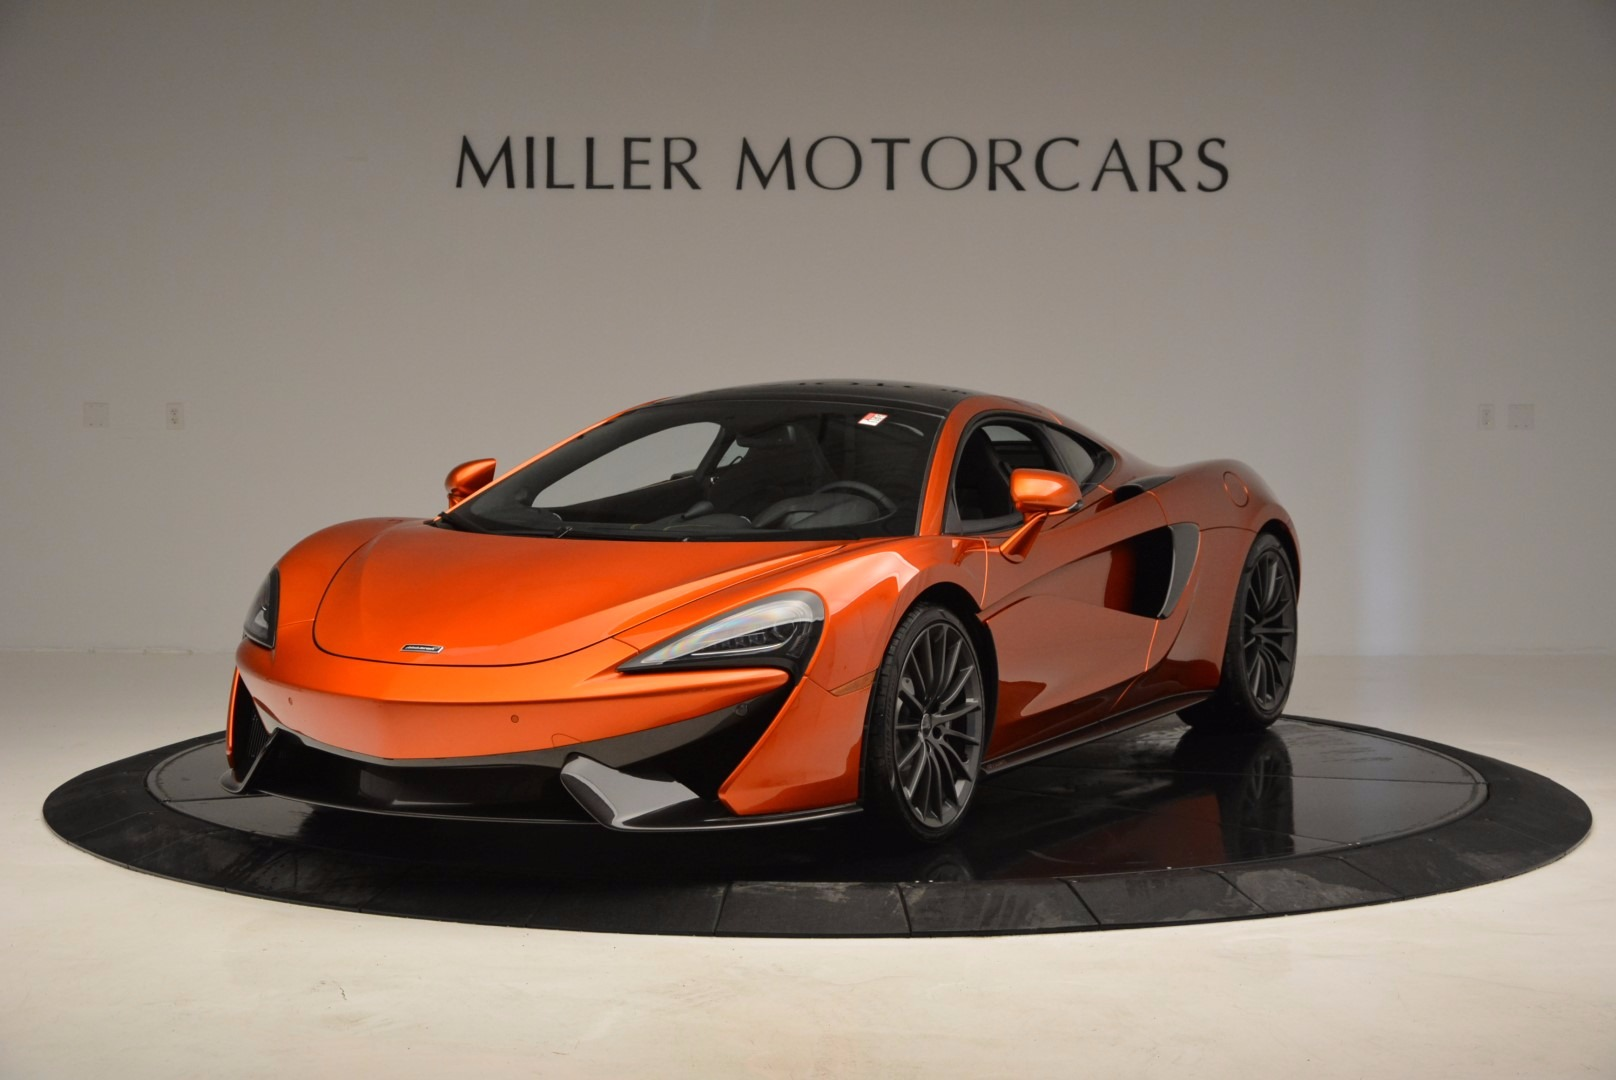 Used 2017 McLaren 570GT Coupe for sale $139,900 at Alfa Romeo of Westport in Westport CT 06880 1